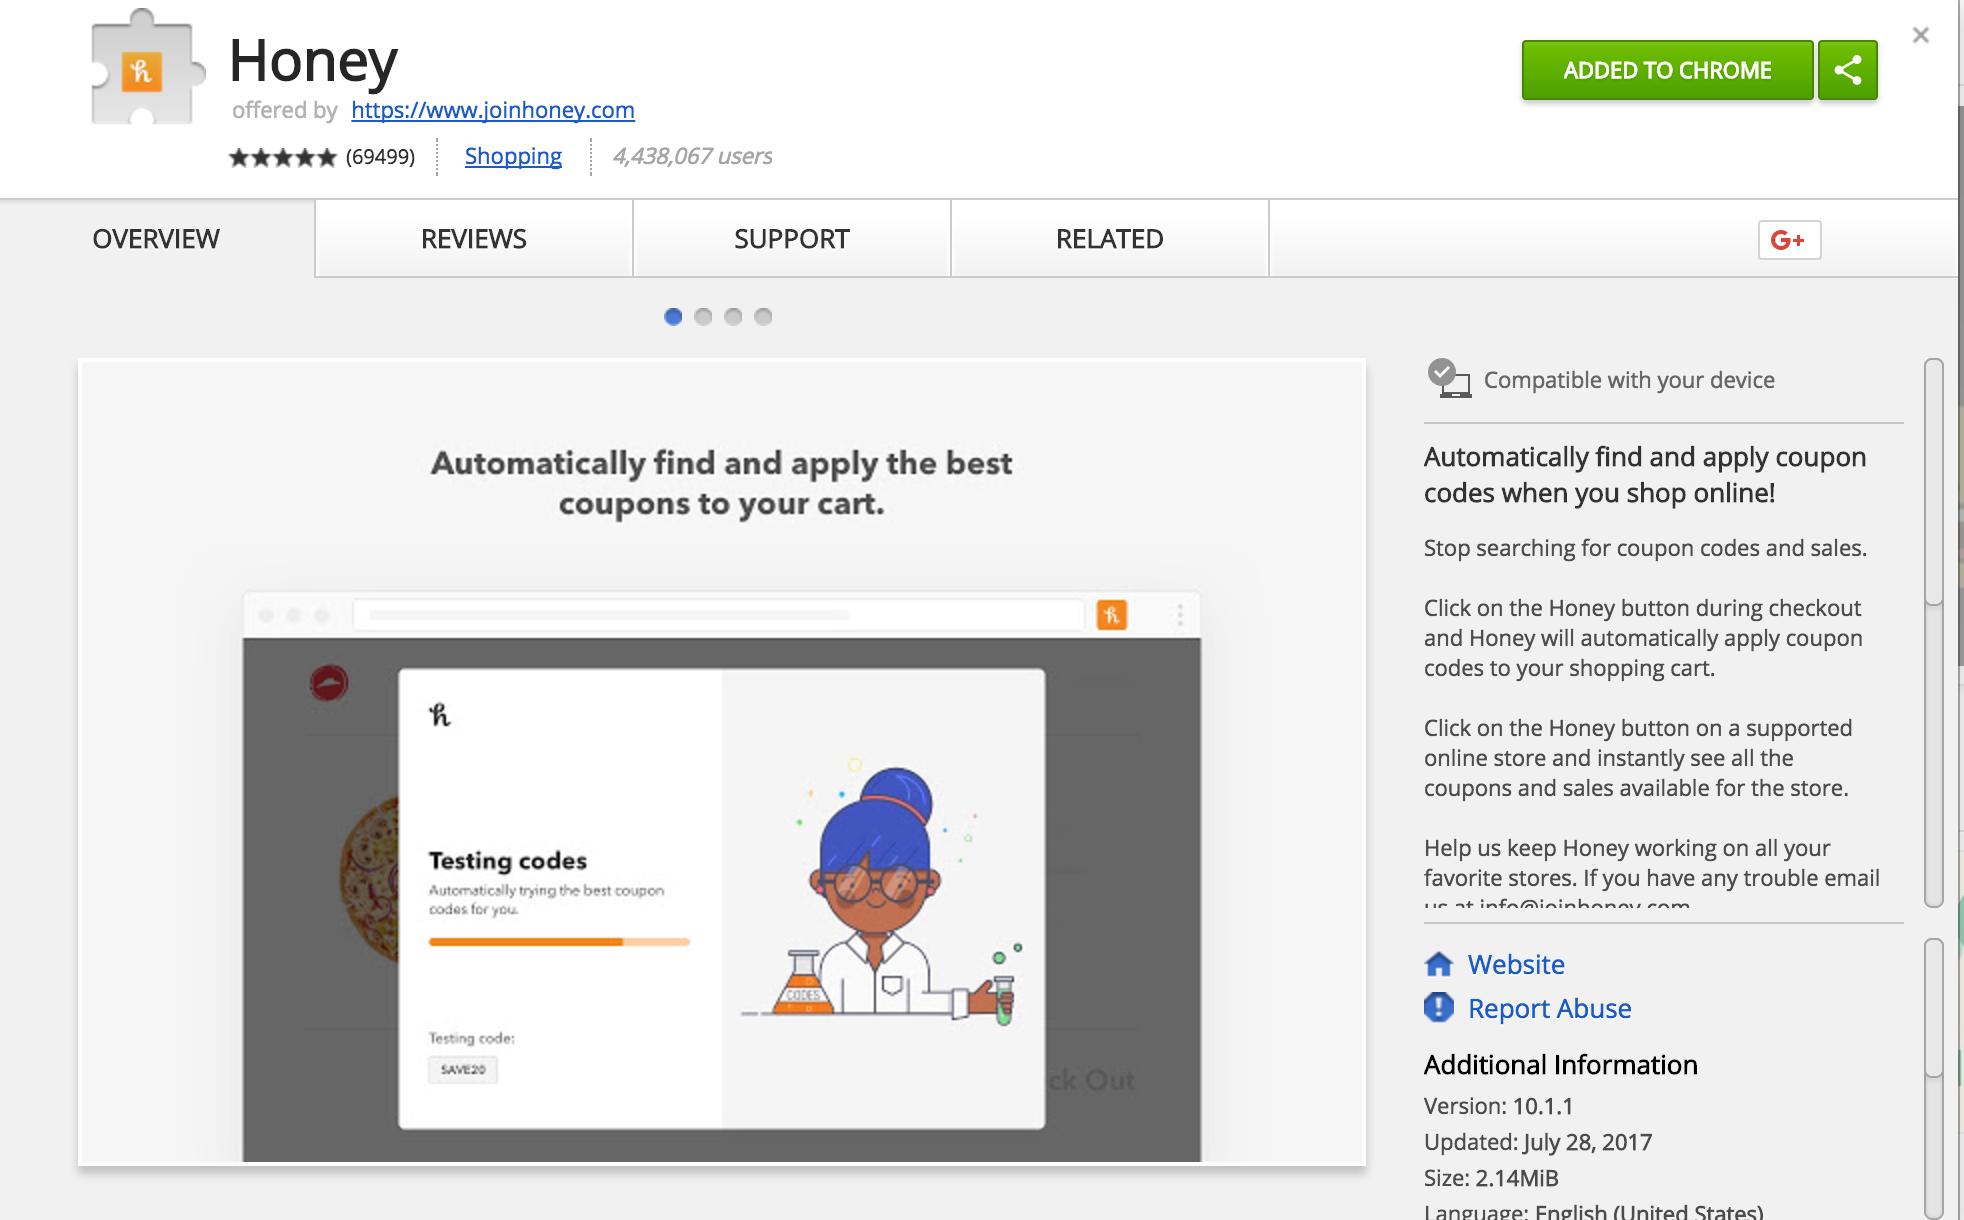 Honey app - Google Chrome Web Store